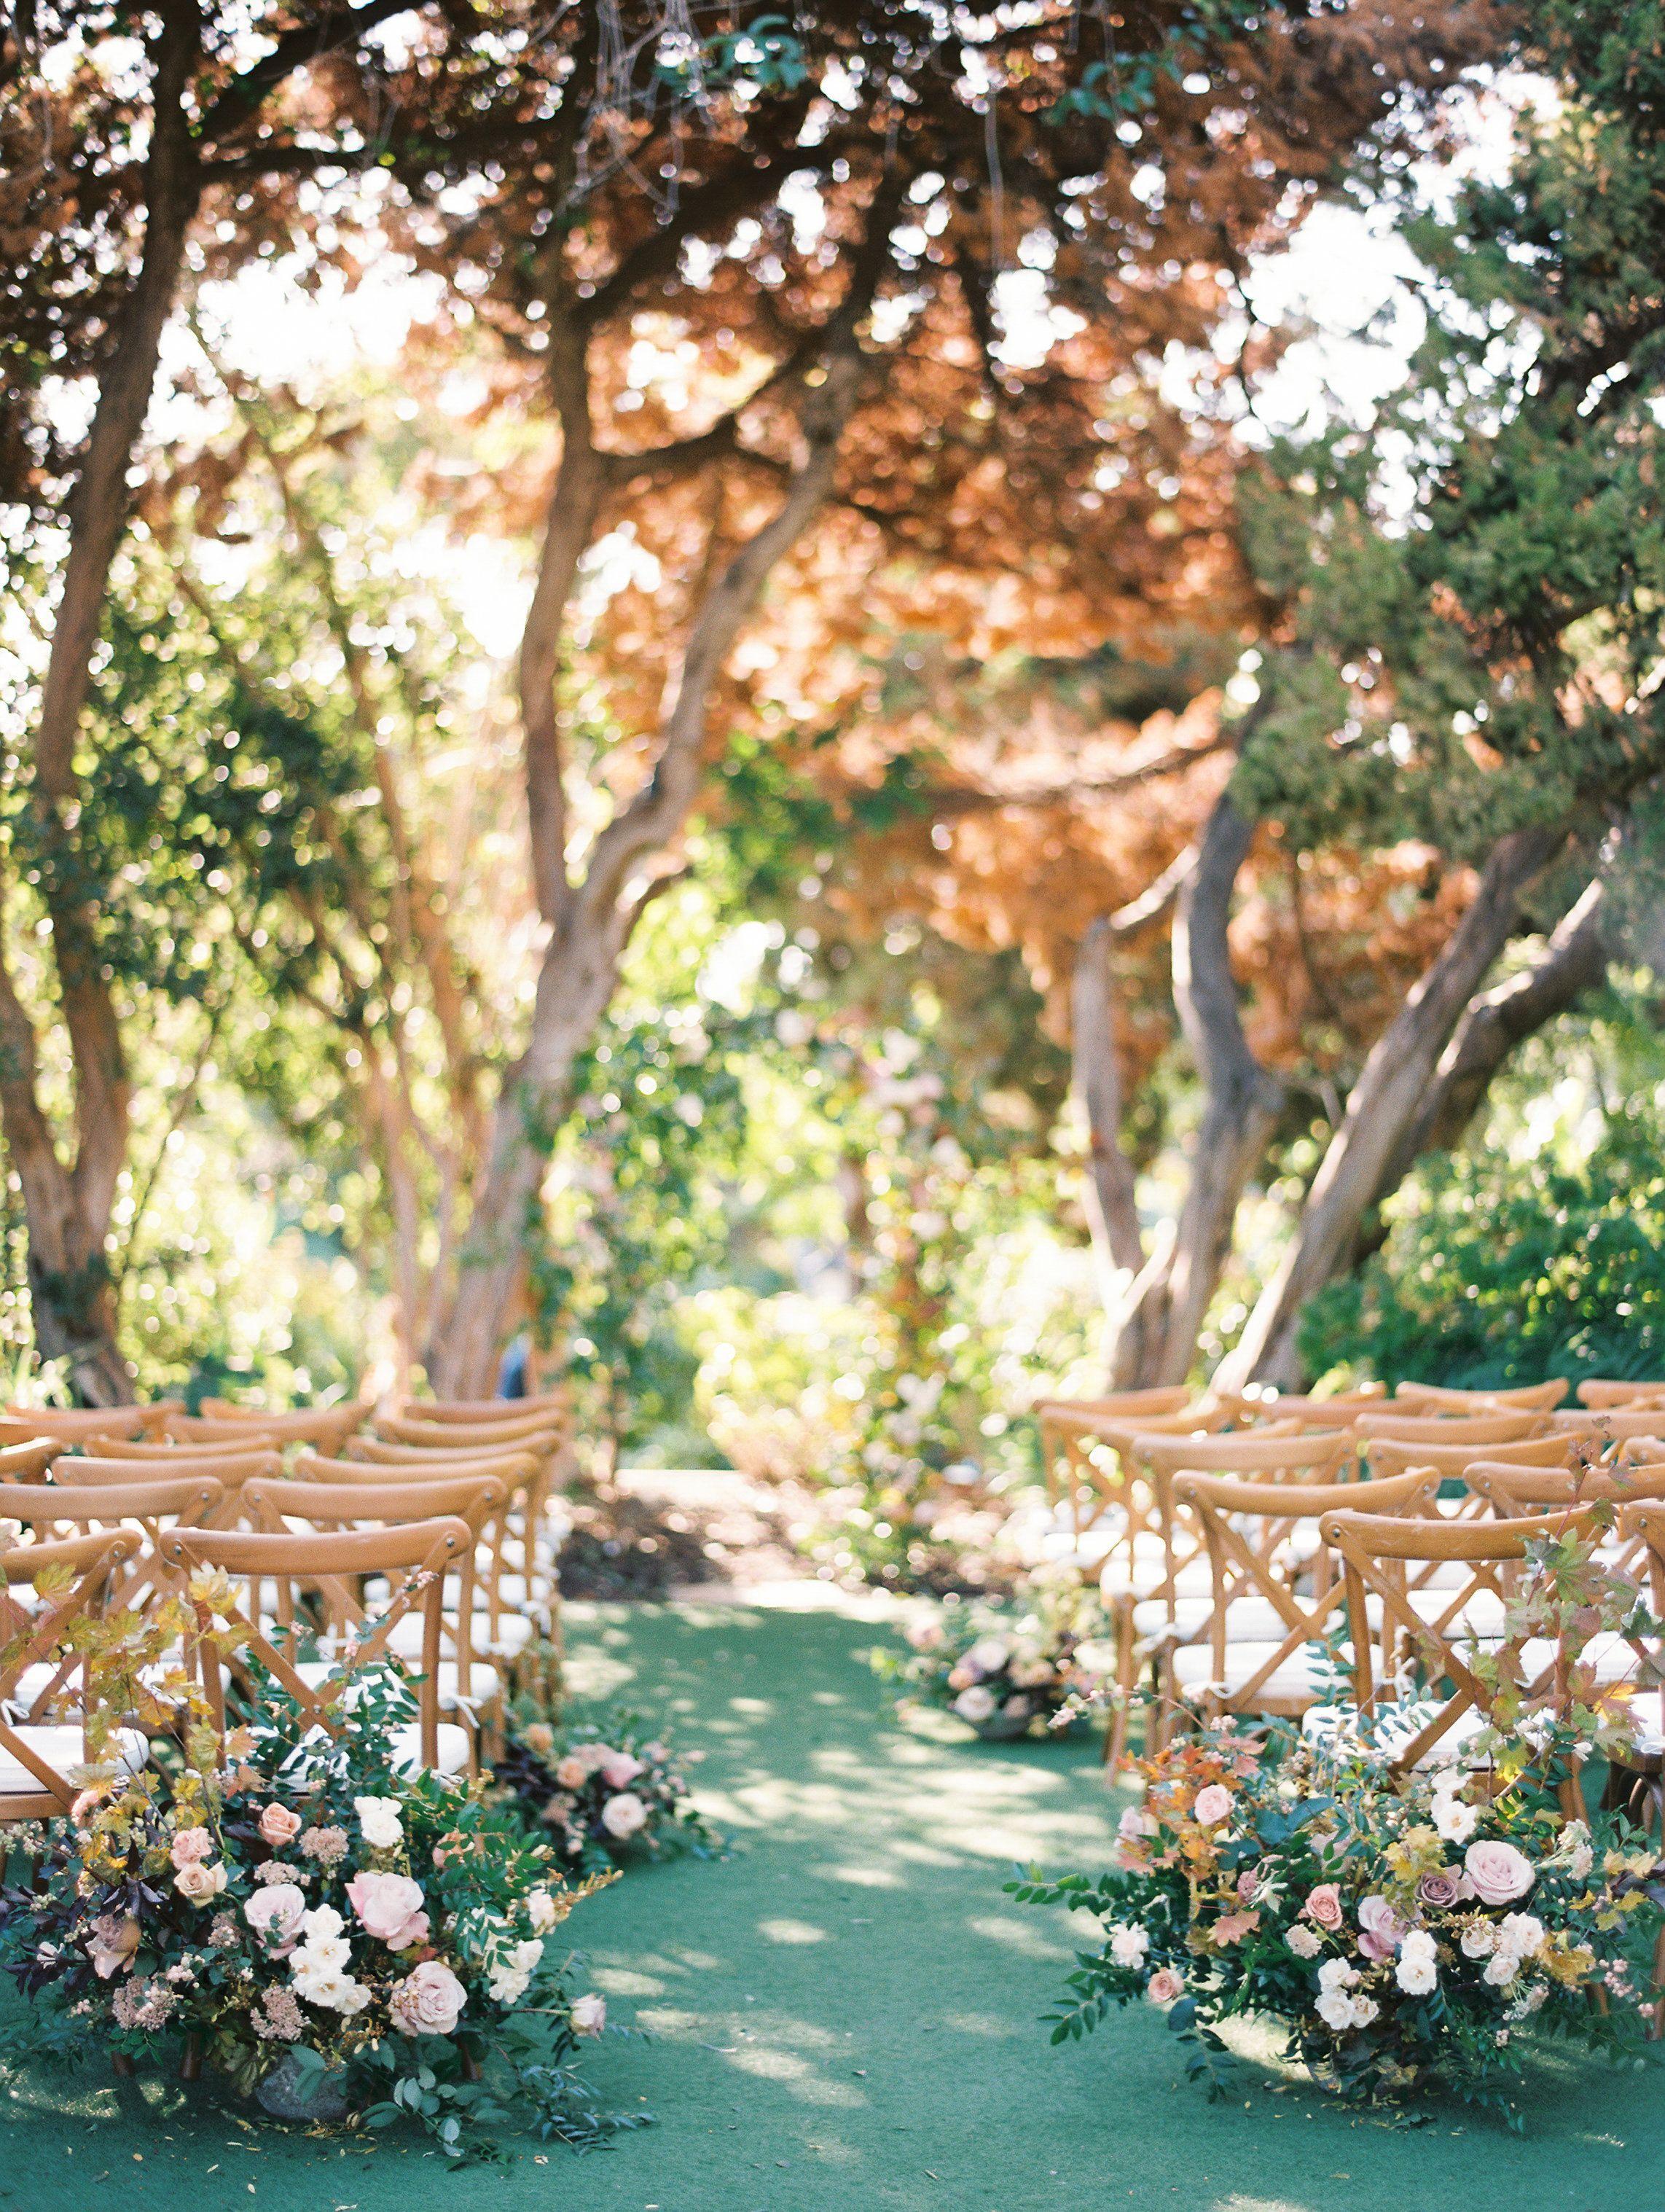 Traditional wedding decor ideas 2018  weddingtips  Enchanted Wedding Ideas  Tips in   Pinterest